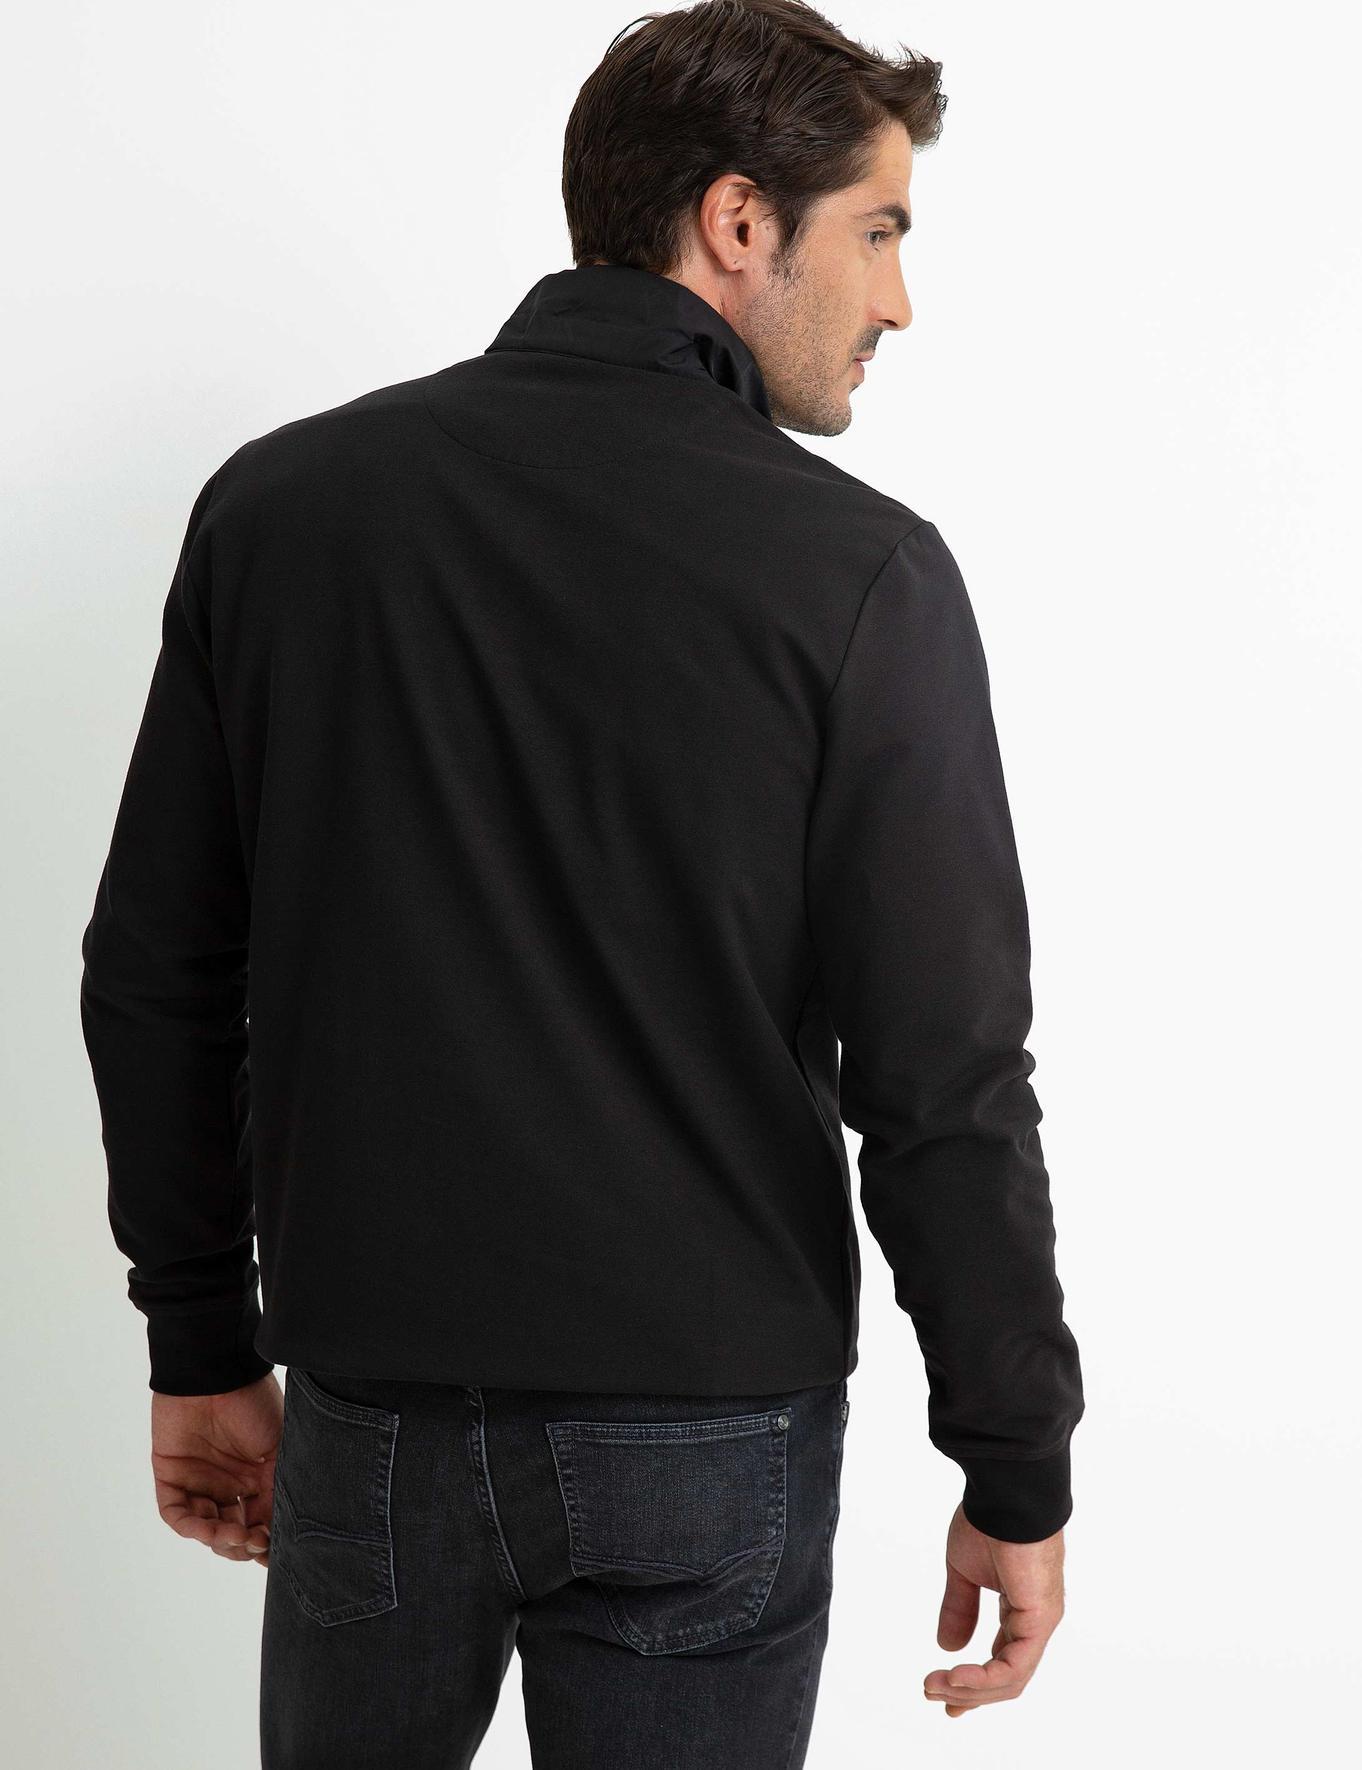 Siyah Slim Fit Sweatshirt - 50197246004